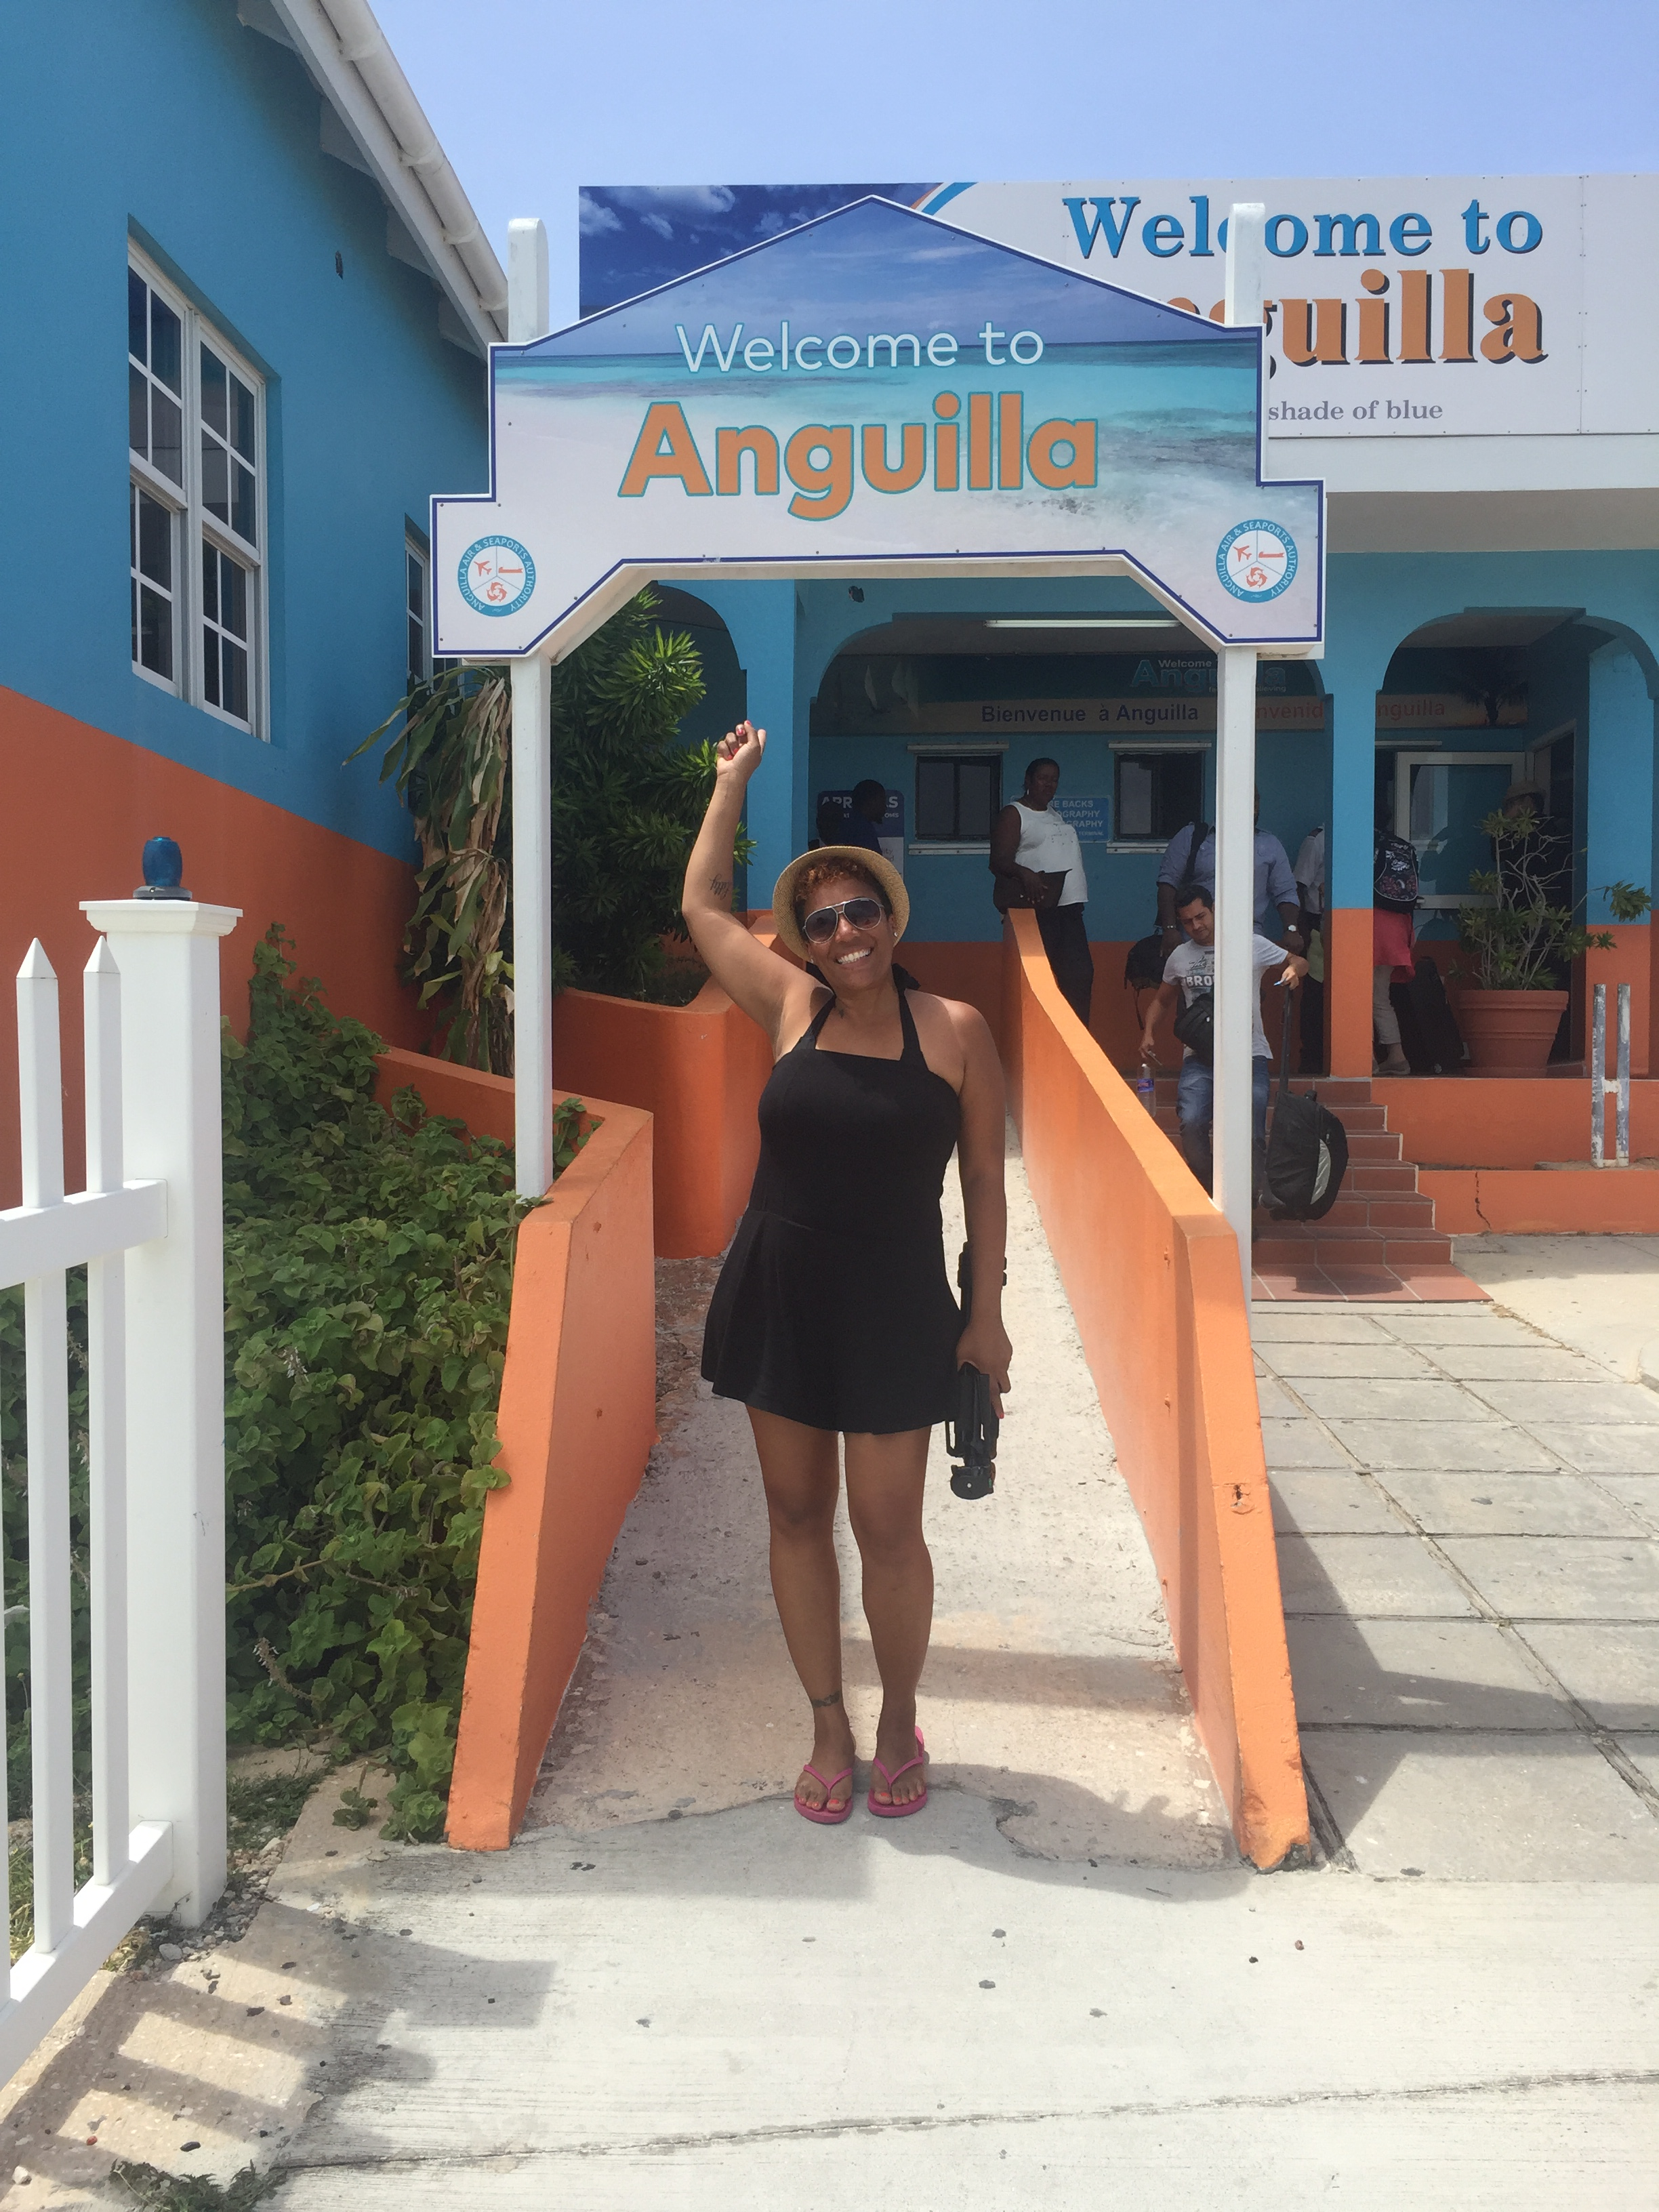 Arrival at Anguilla